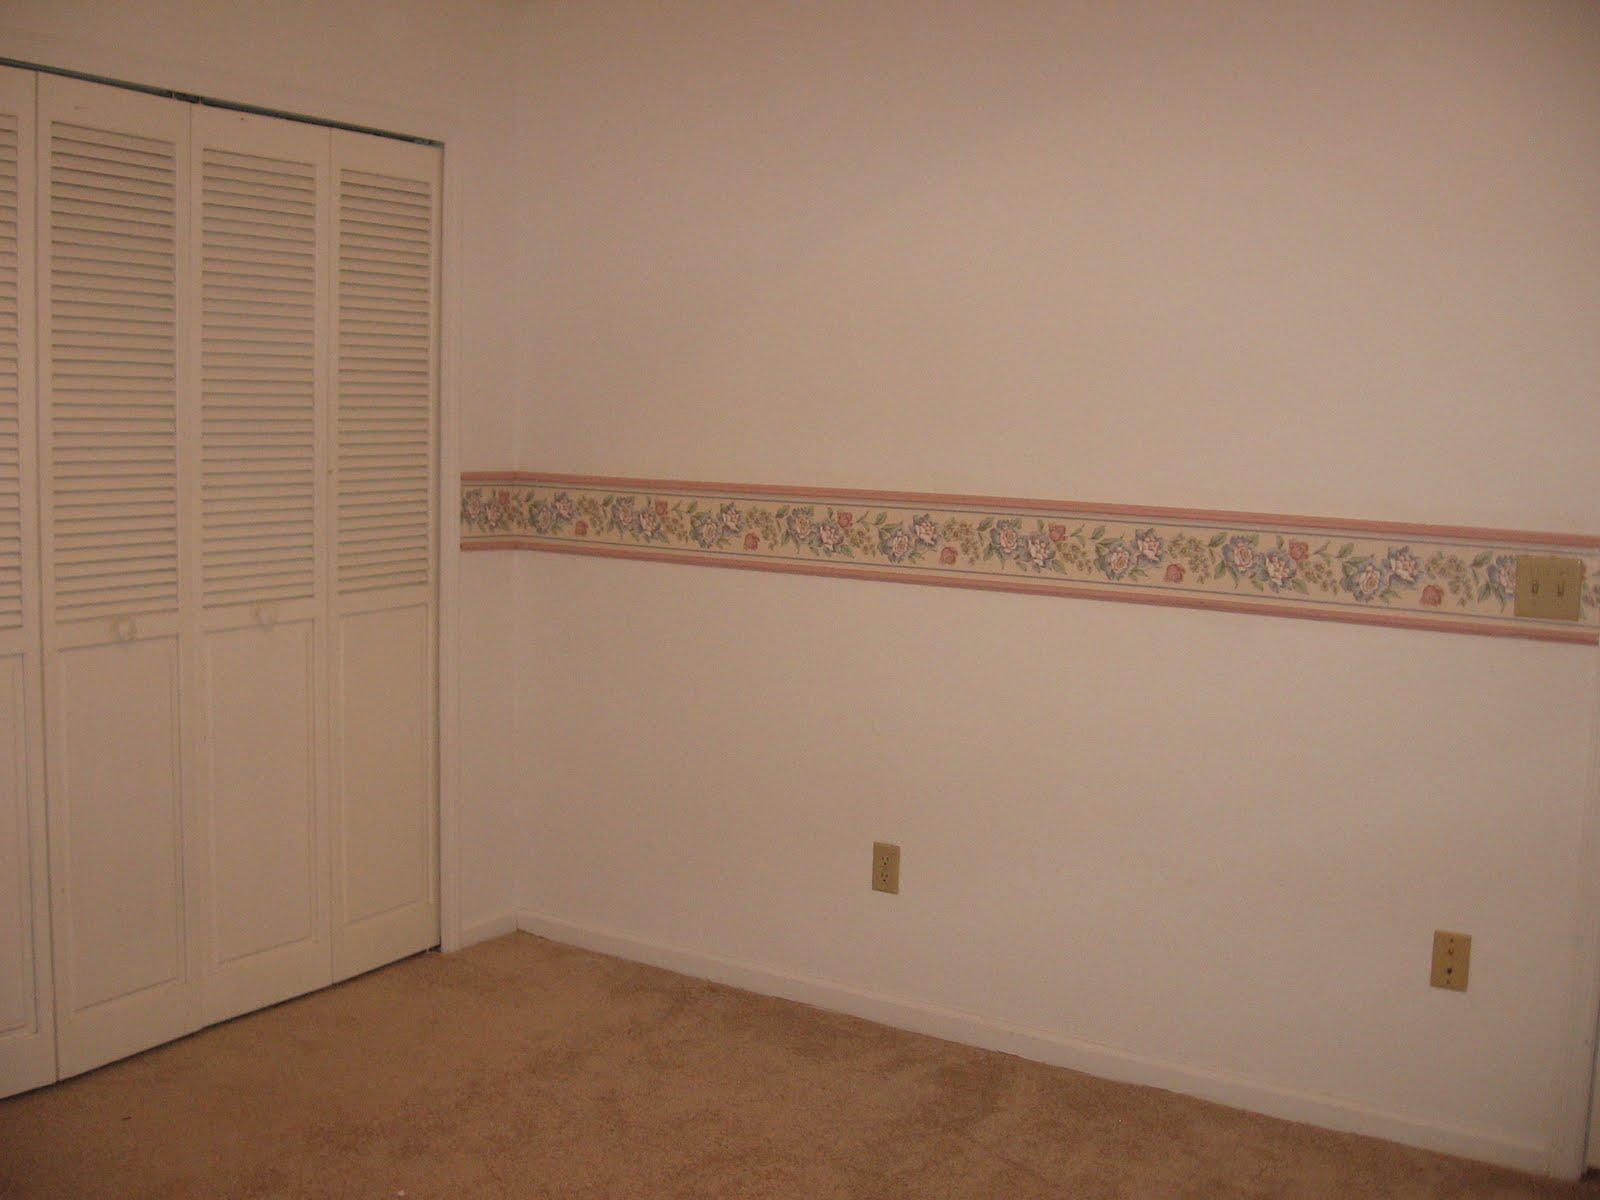 Cherry wood crown molding wallpaper border janet2B2 1600x1200